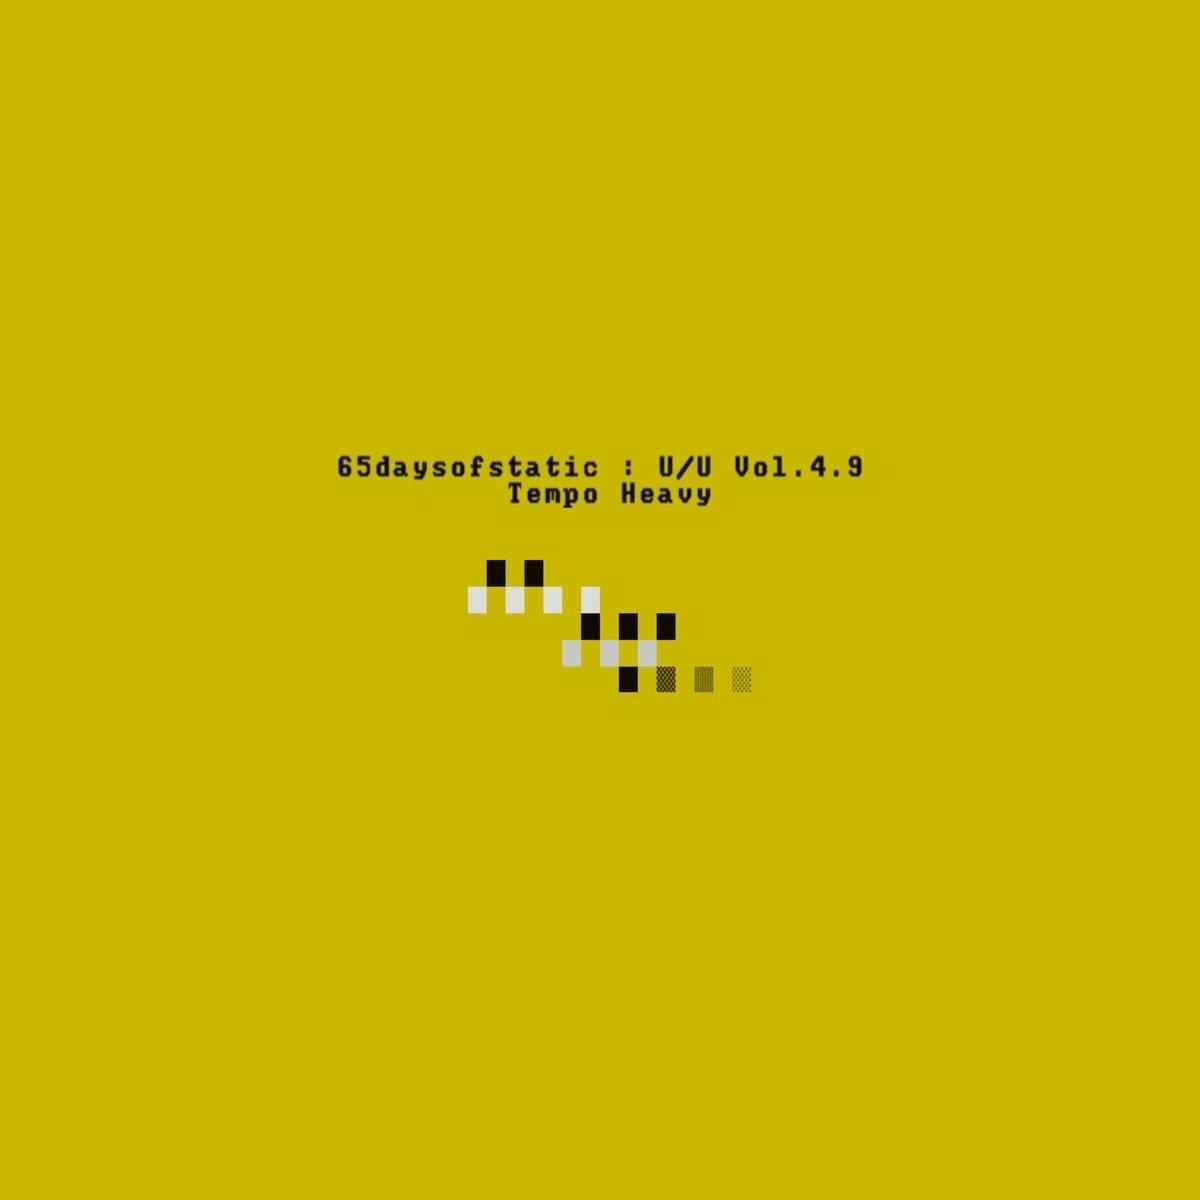 65daysofstatic - Tempo Heavy (EP)